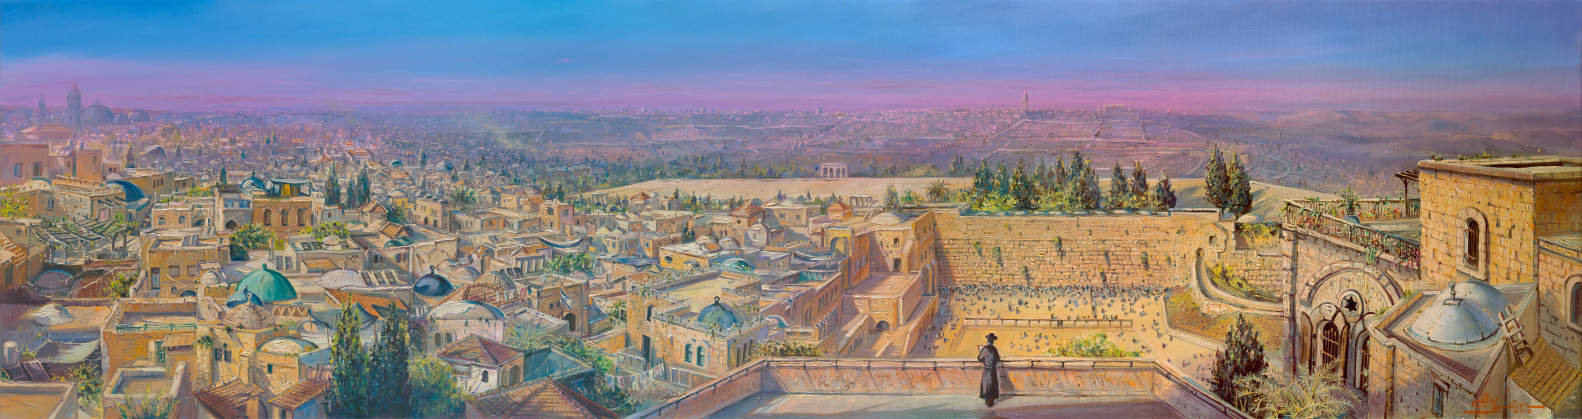 Original Oil Painting: Roofs of Jerusalem